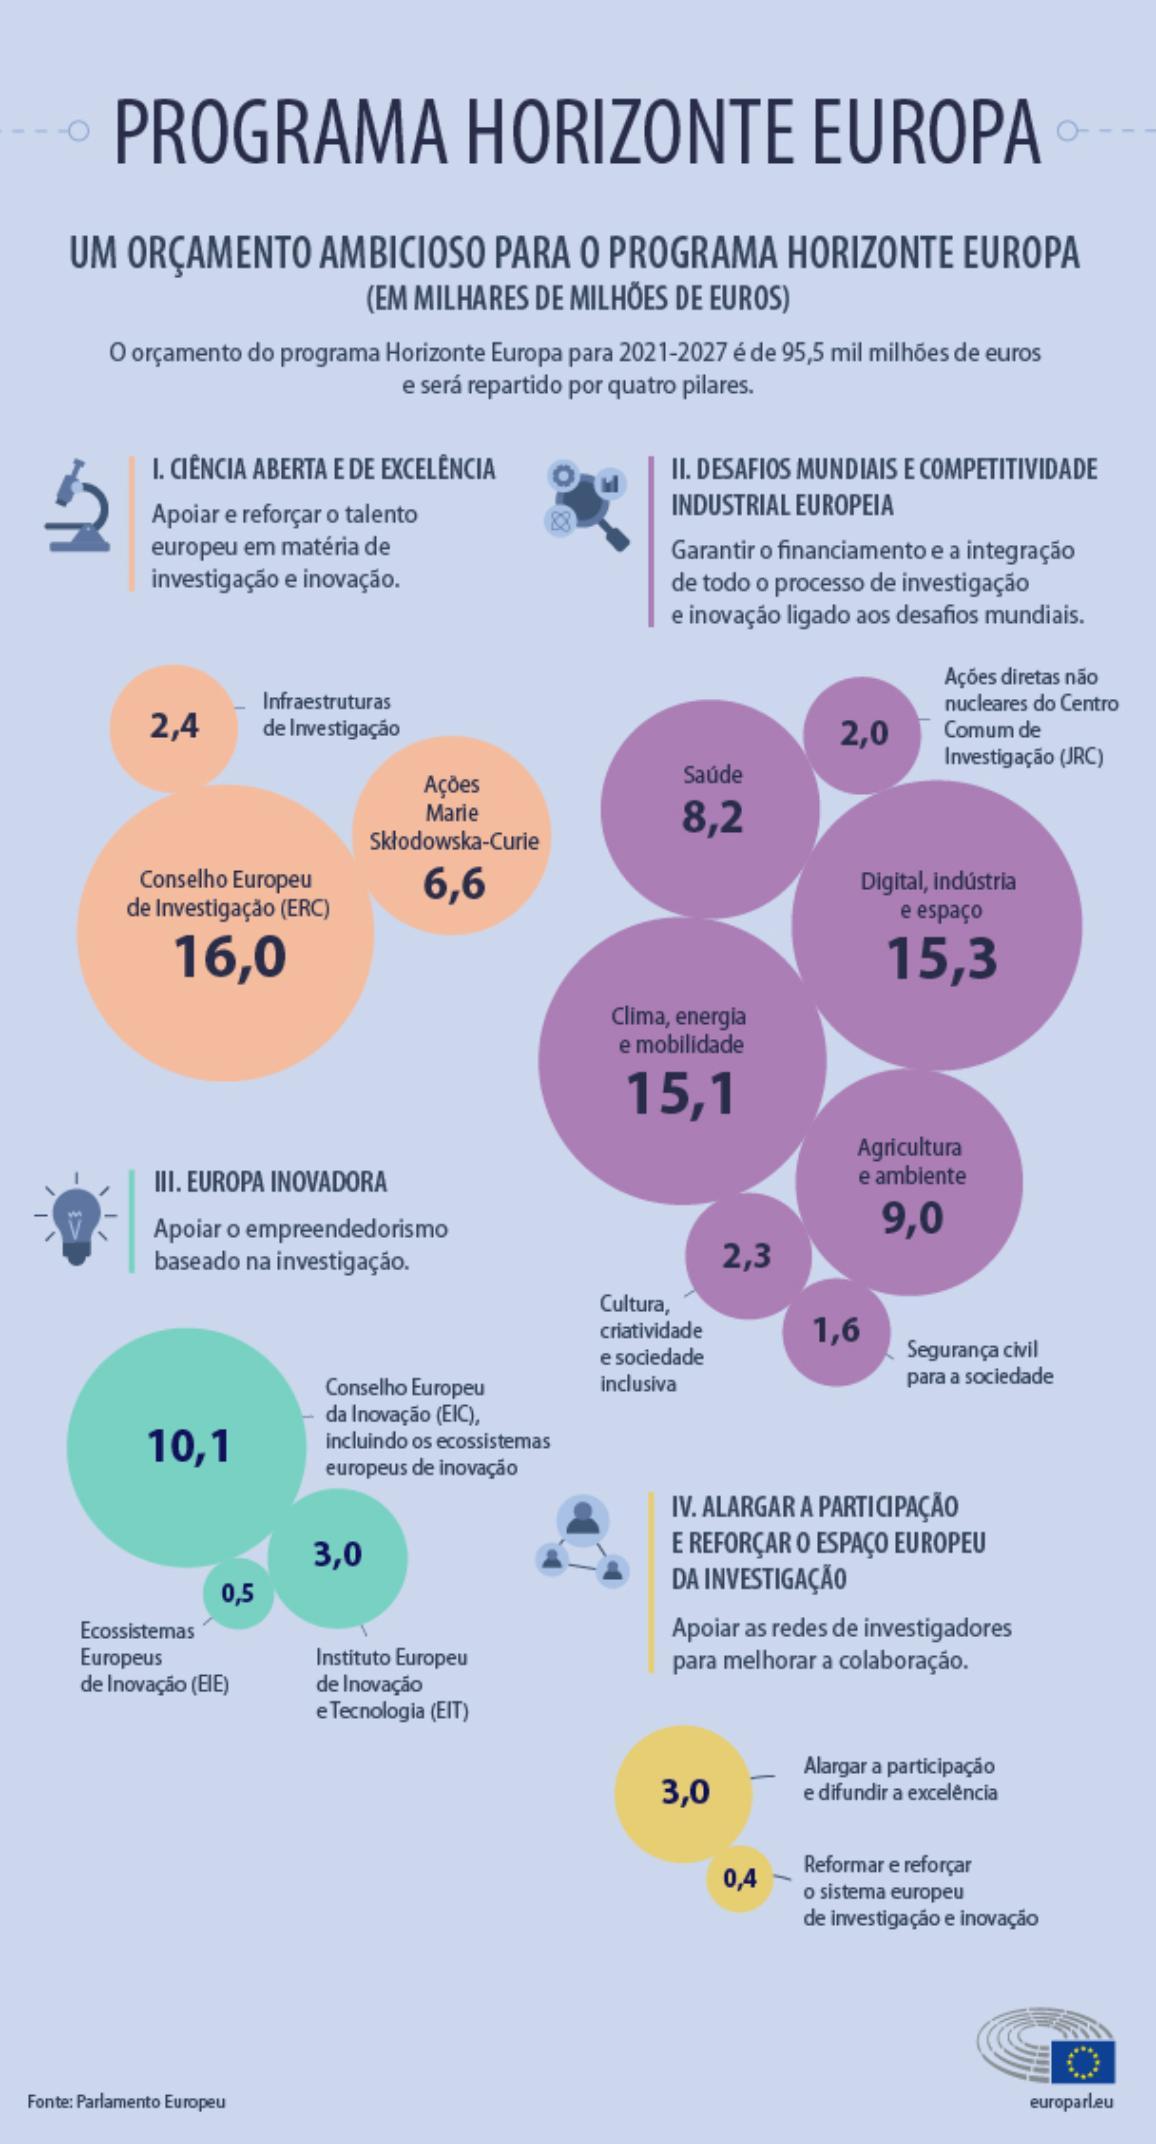 Infografia que explica o programa Horizonte Europa, orgamento e pilares